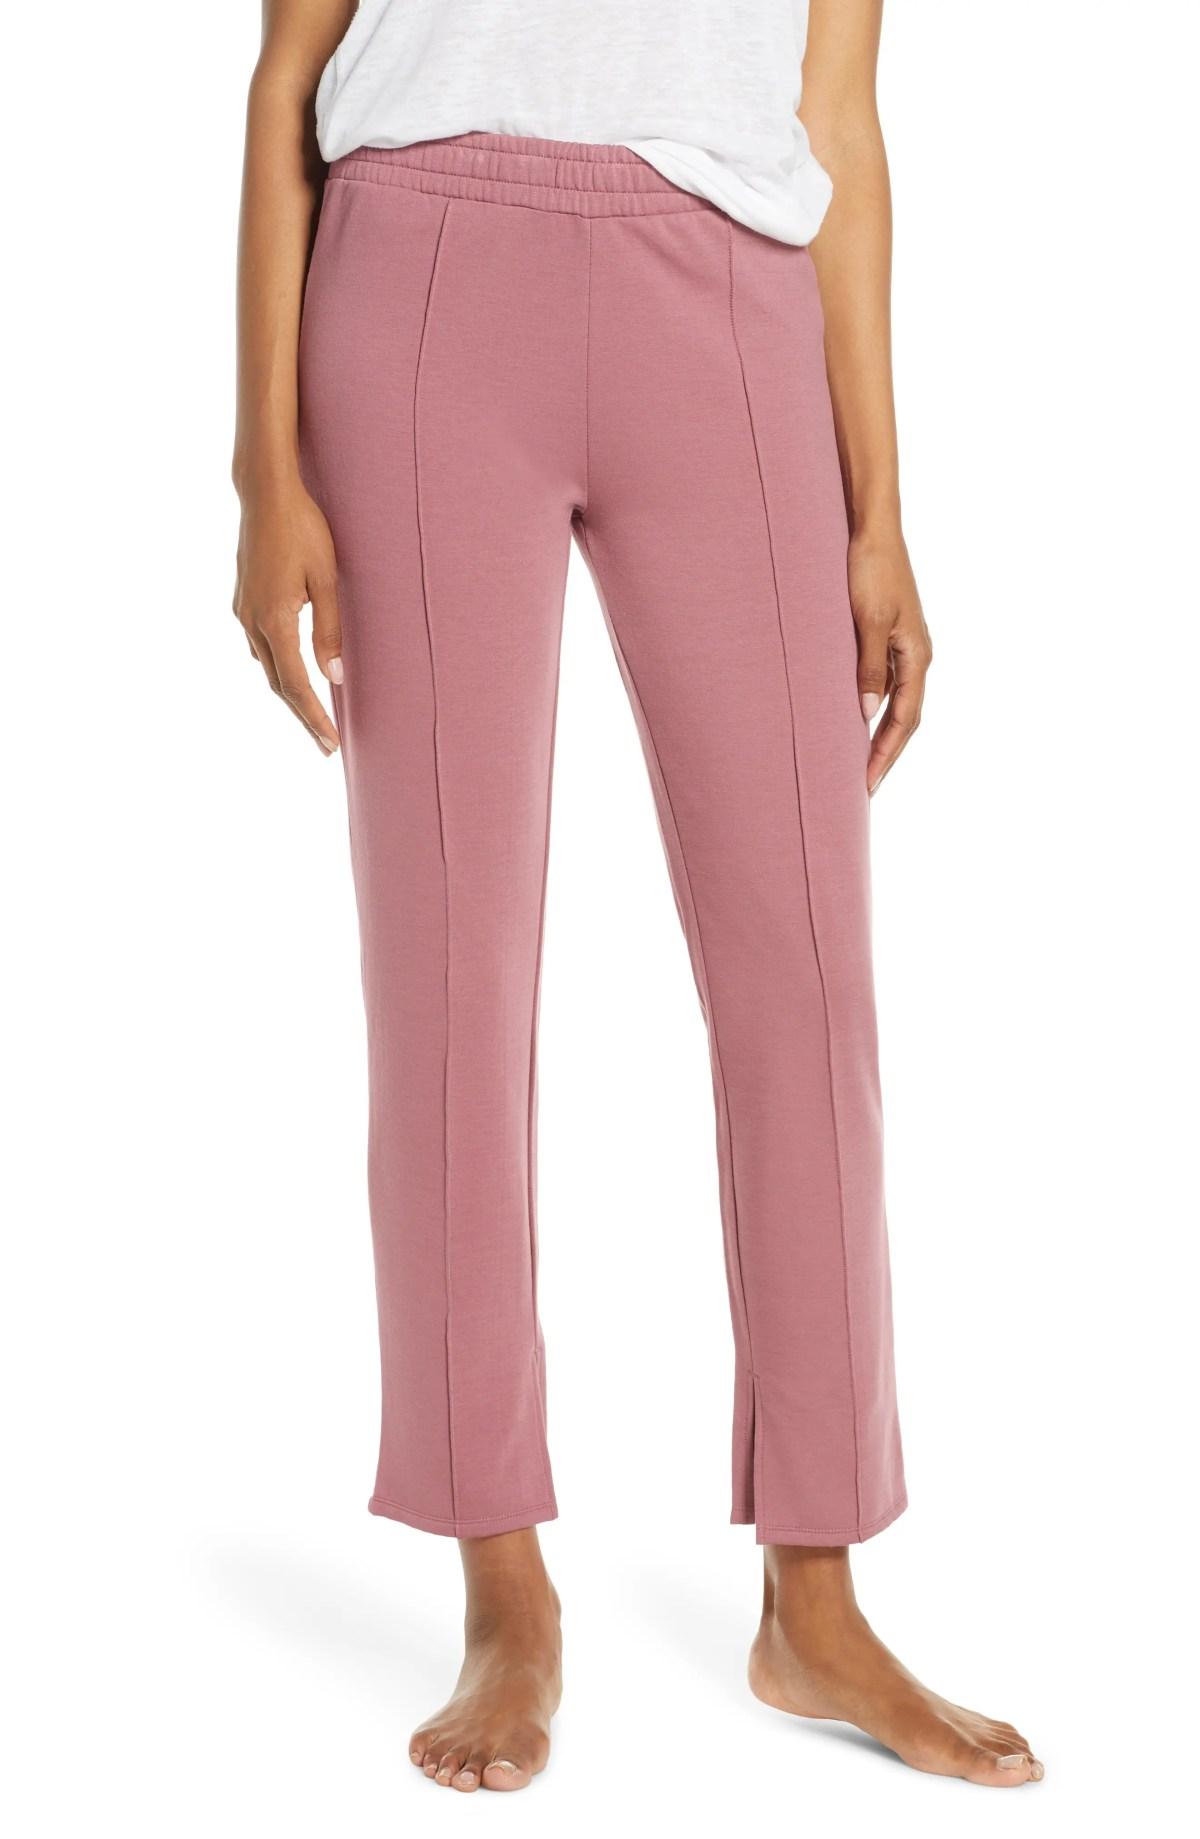 JOE'S Straight Leg Sweatpants, Main, color, ROSE SNAP